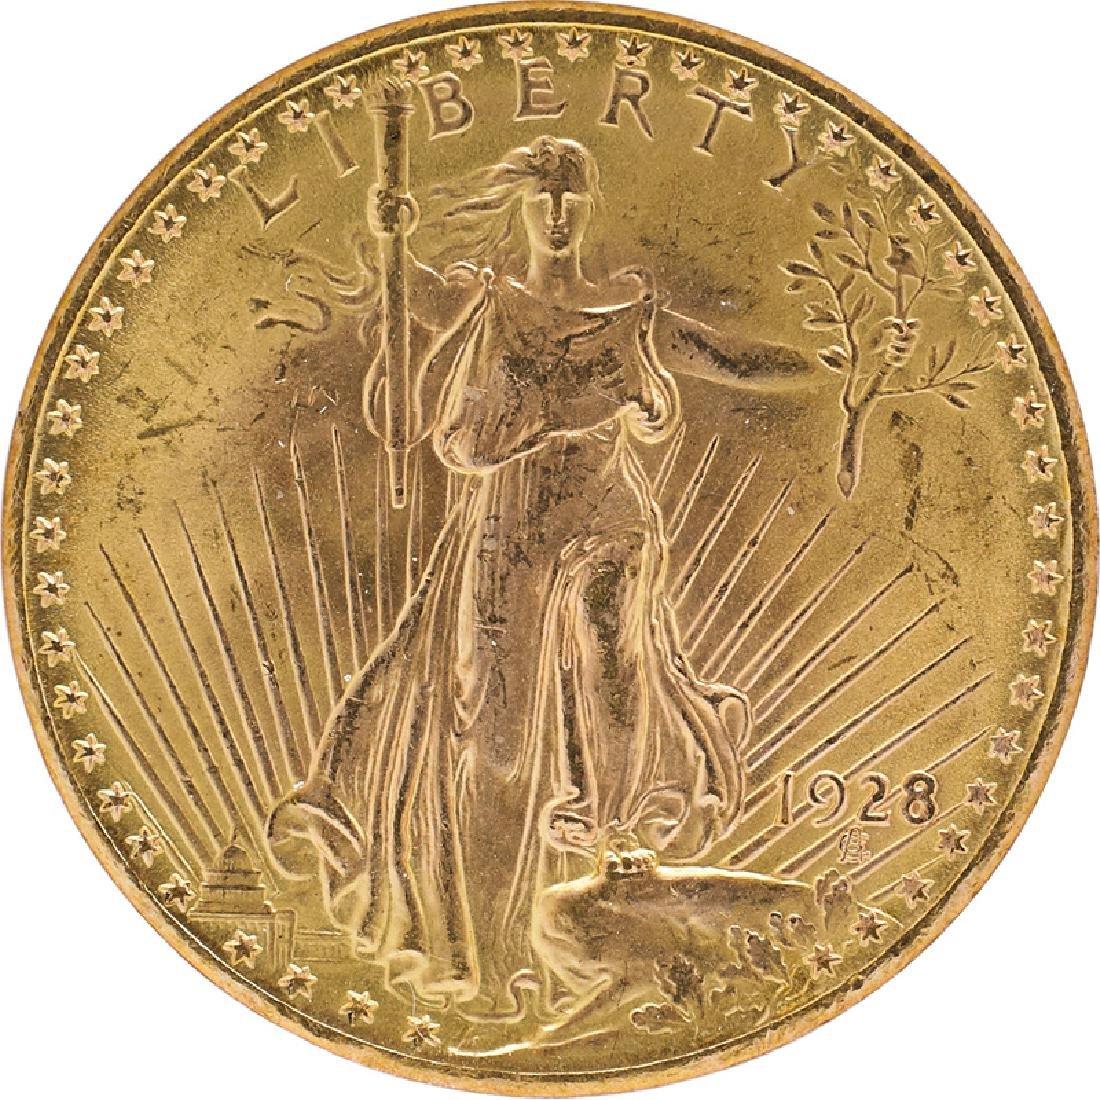 U.S. 1928 ST. GAUDENS $20 GOLD COIN